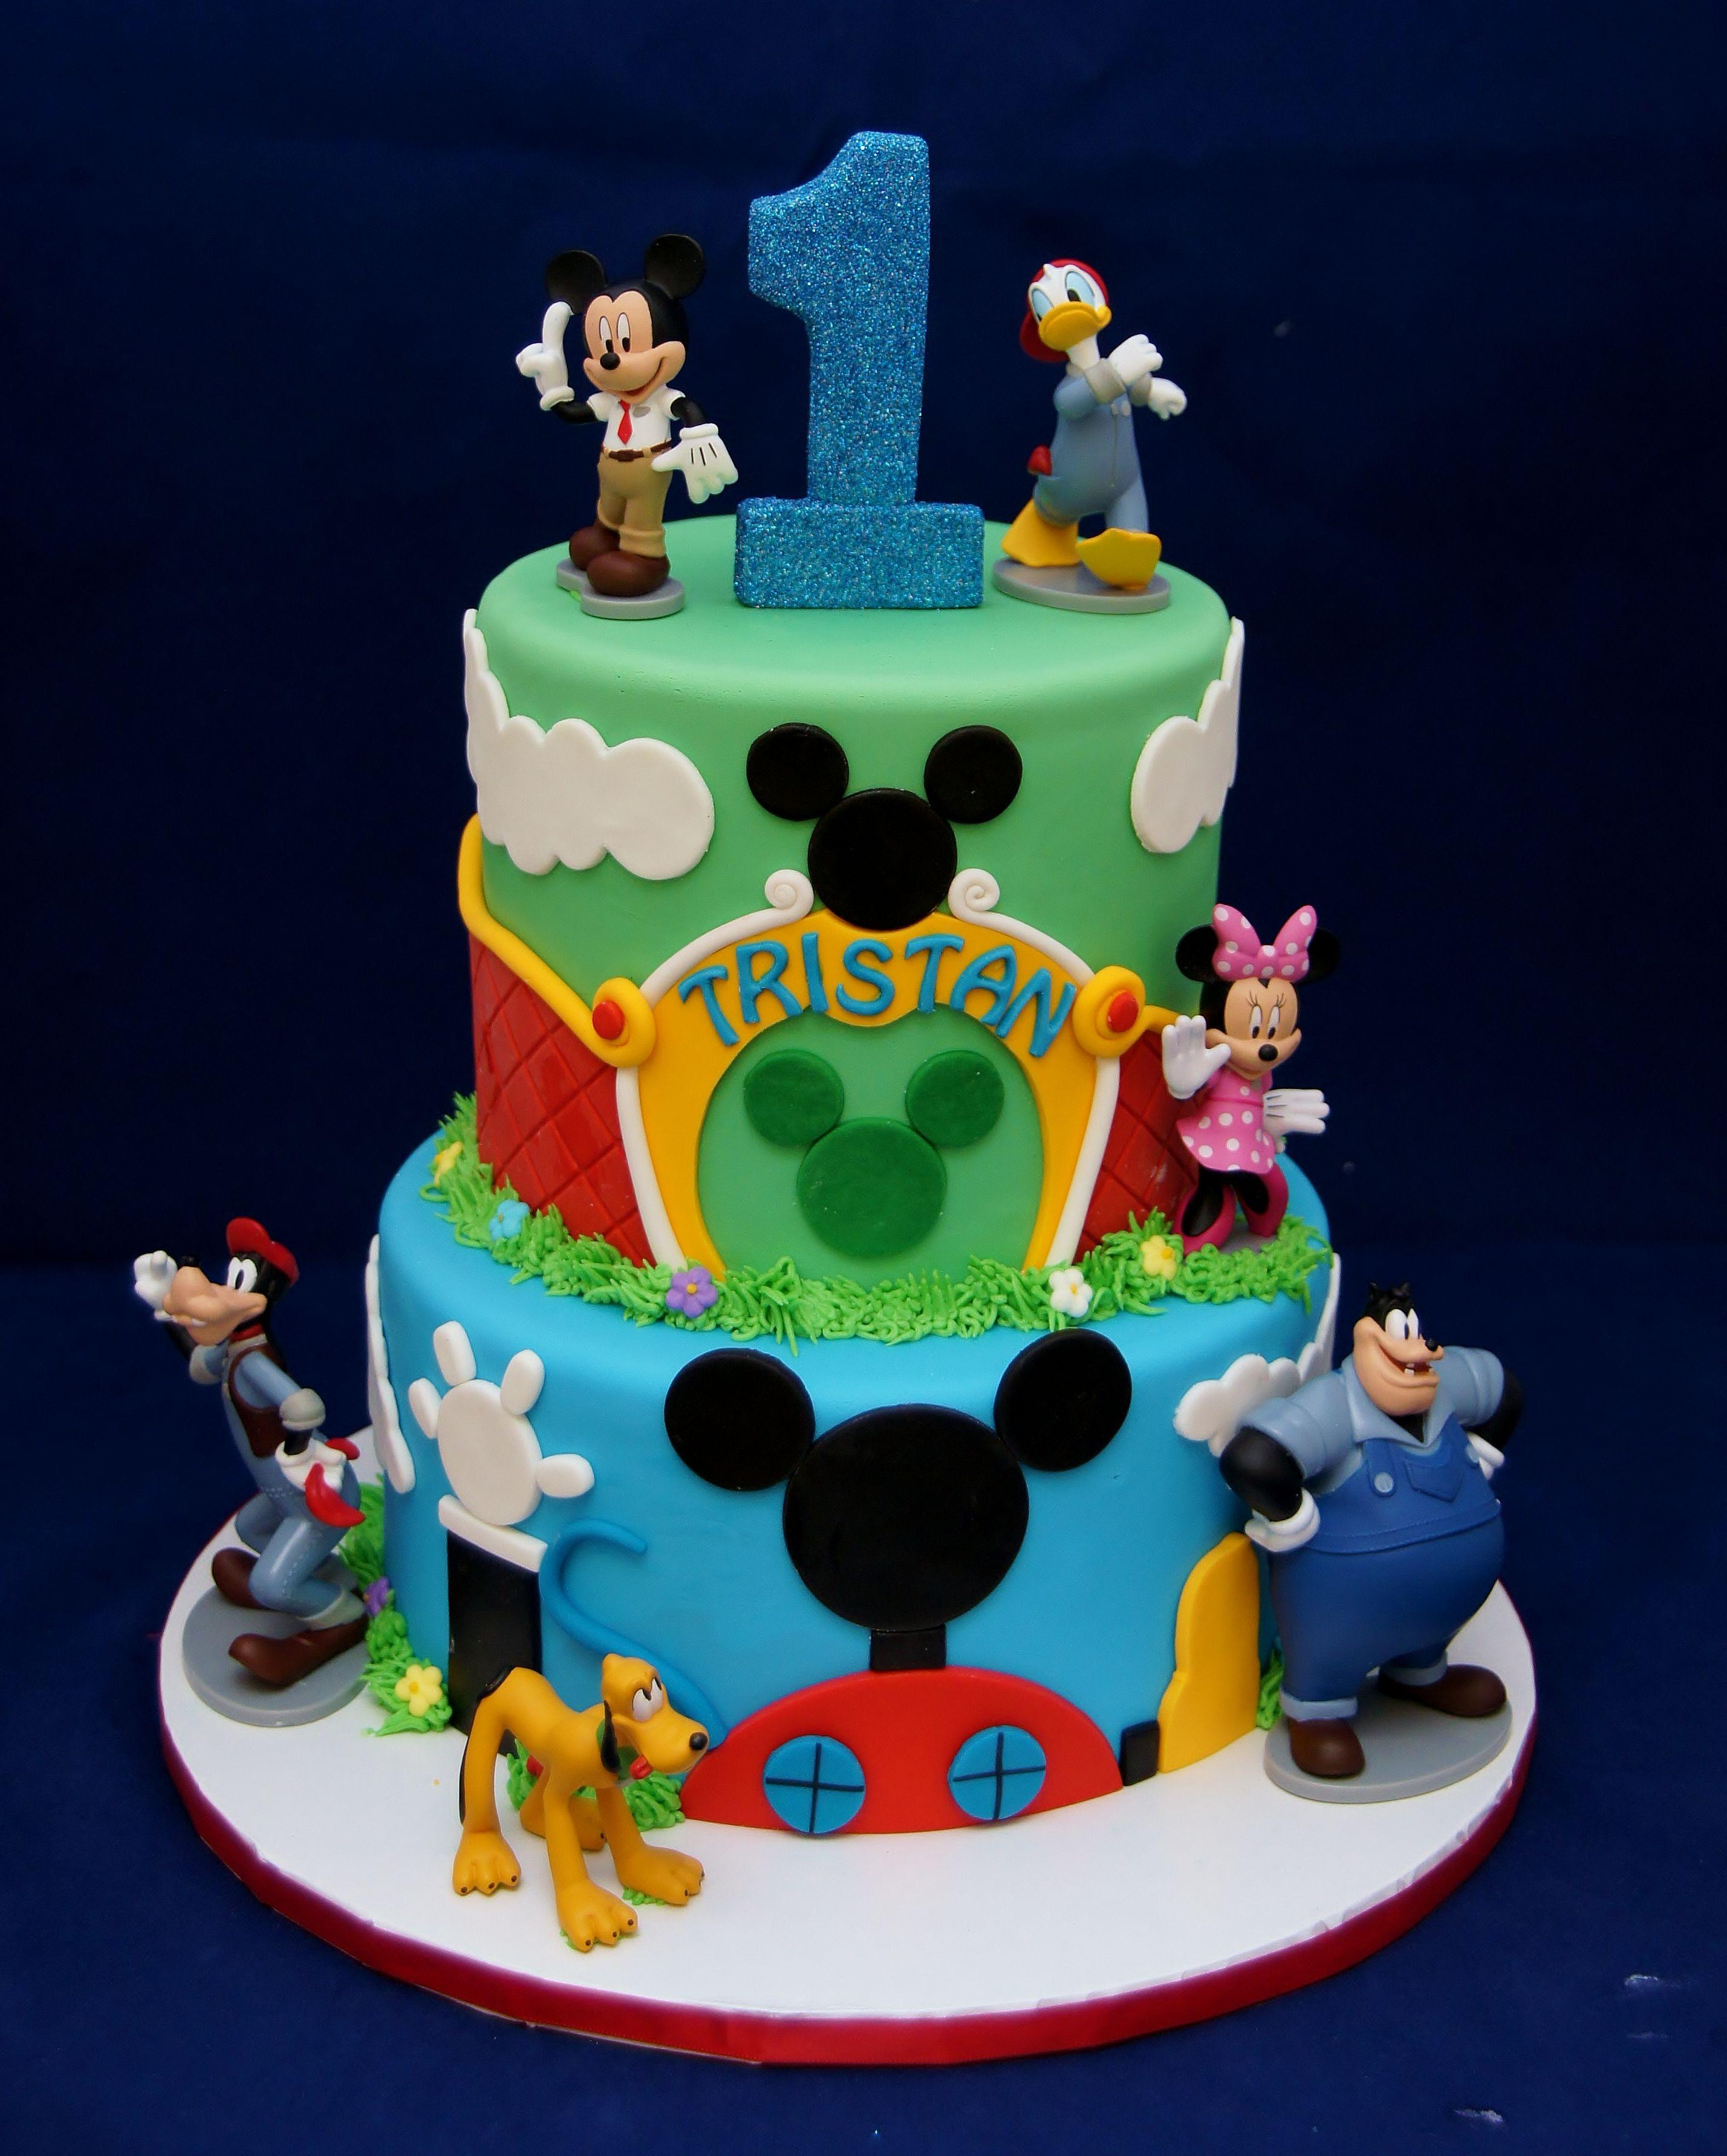 Awe Inspiring Mickey Mouse Club Mickey Park Themed Cake 1St Birthday In Funny Birthday Cards Online Hendilapandamsfinfo